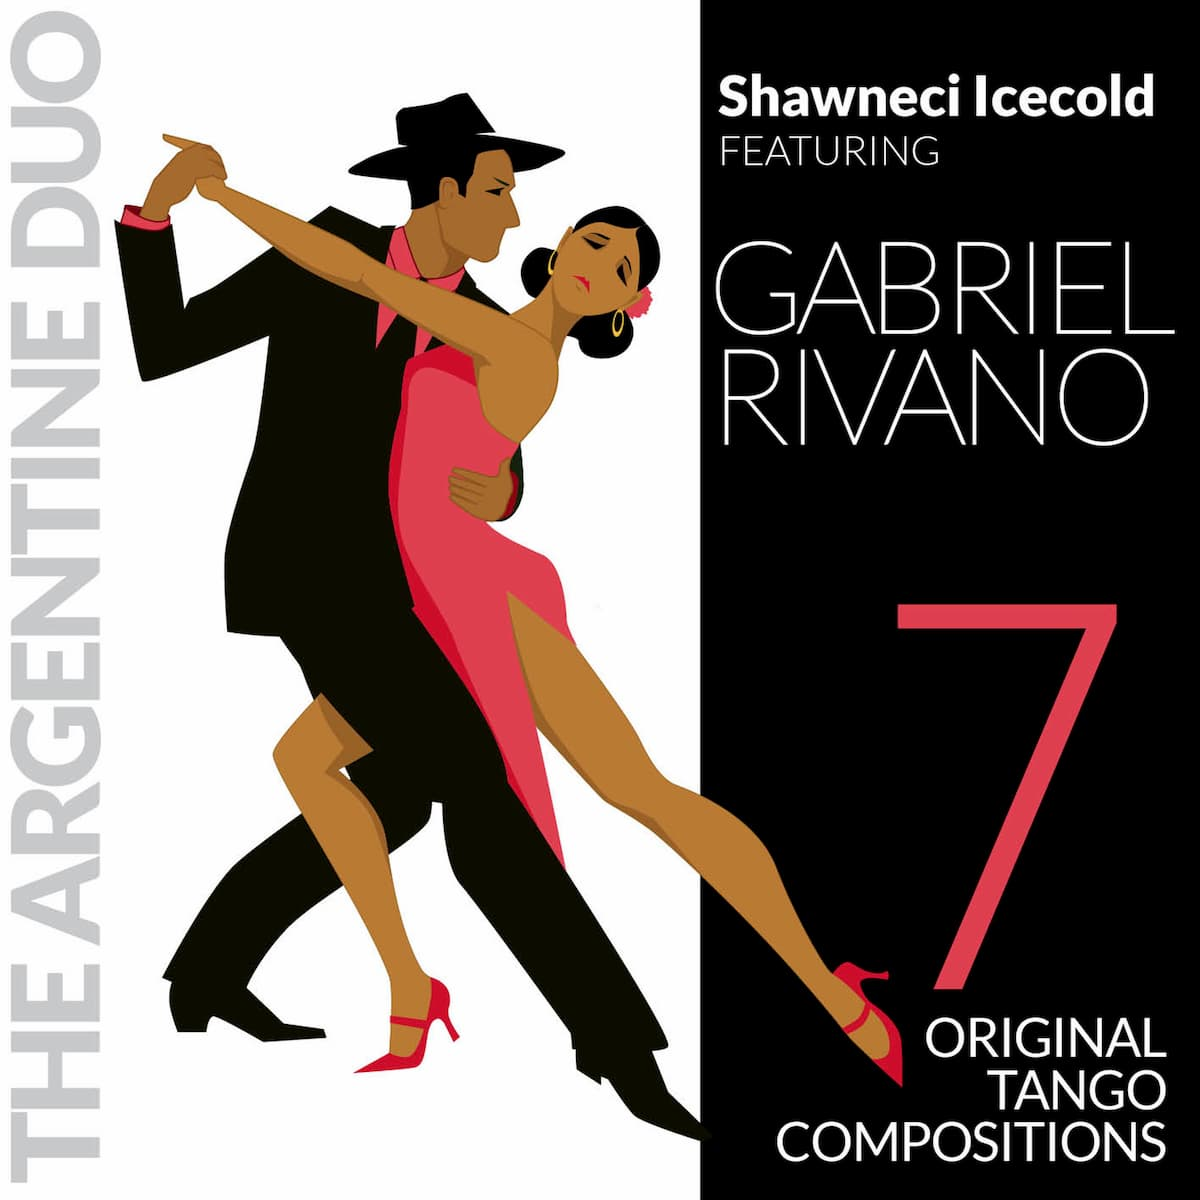 Tango-Musik-Album von Shawneci Icecold feat. Gabriel Rivano The Argentine Duo